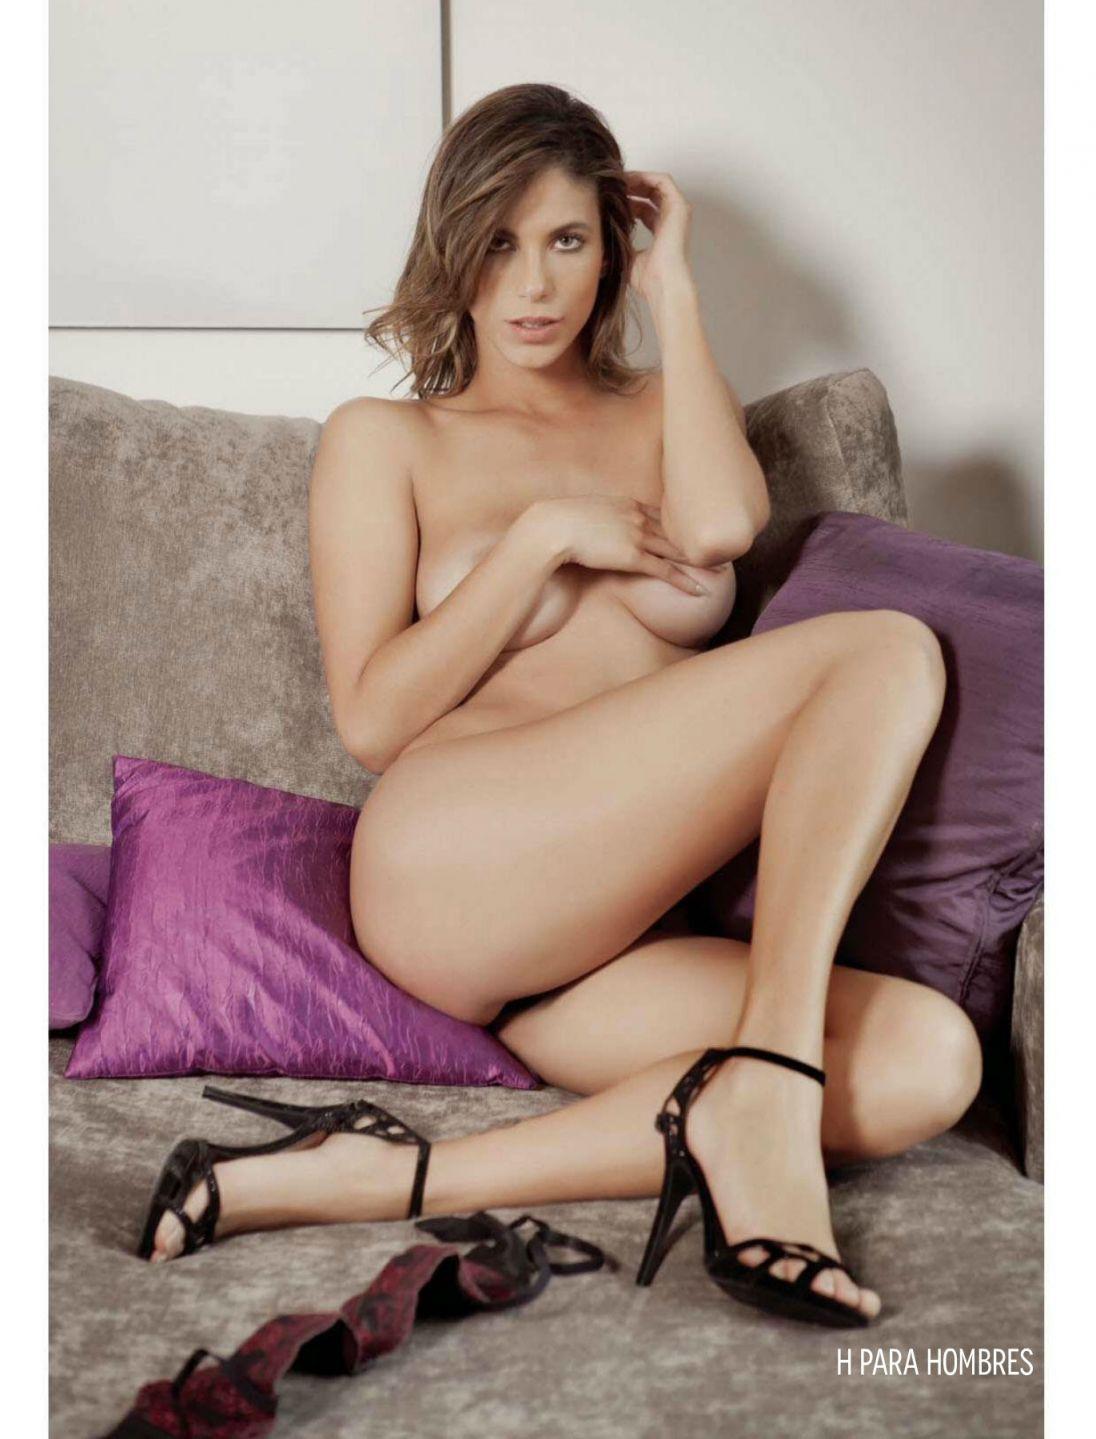 Bruna Goncalves Topless 1 TheFappening.nu